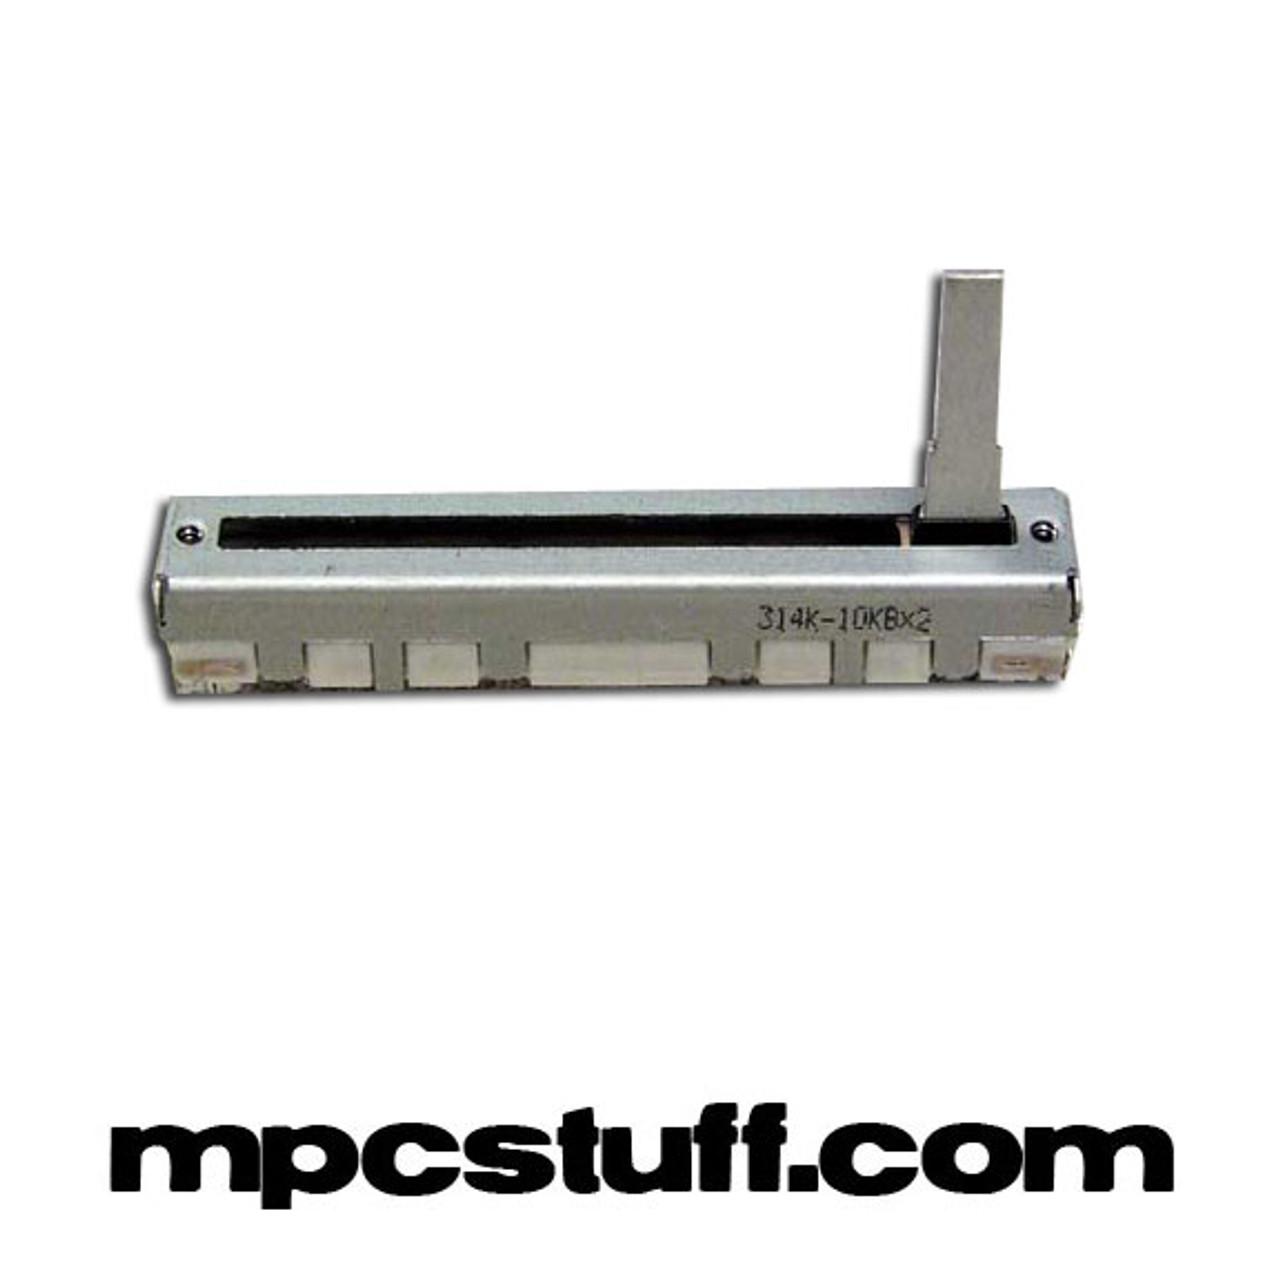 SLIDER POTENTIOMETER MPC 2000 5000 /& QLINK FADER REPLACEMENT 2000XL,2500 4000